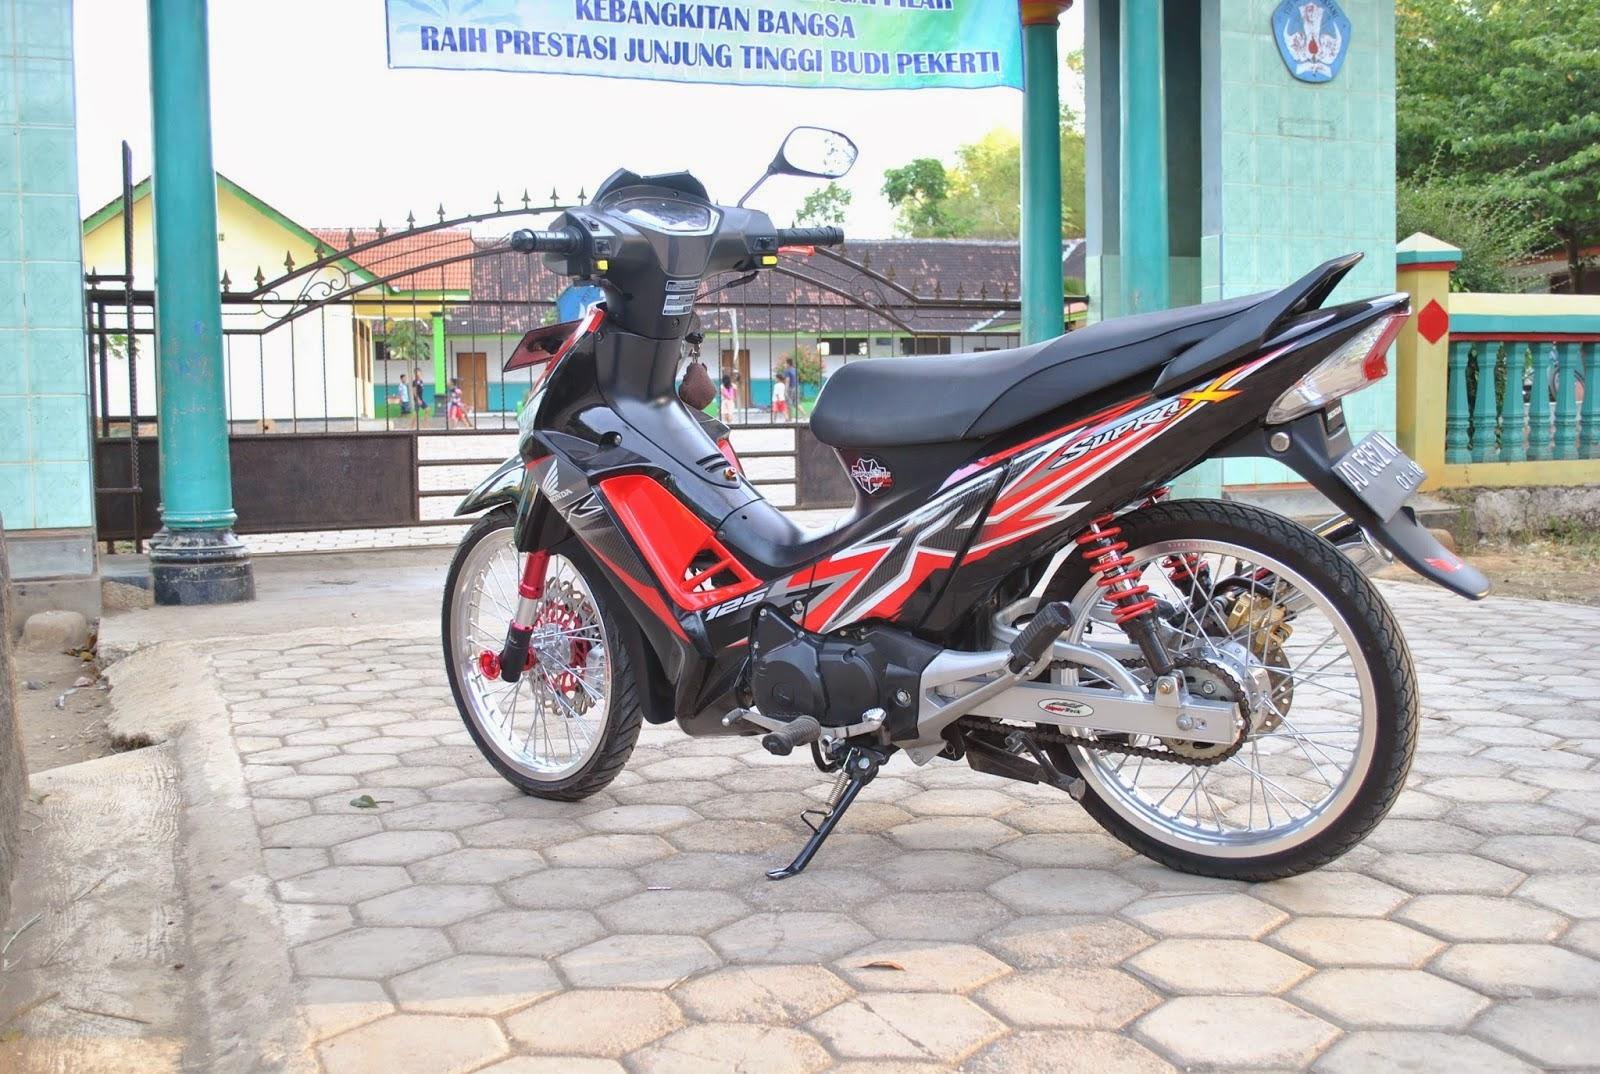 Modifikasi Motor Supra X 125 Minimalis